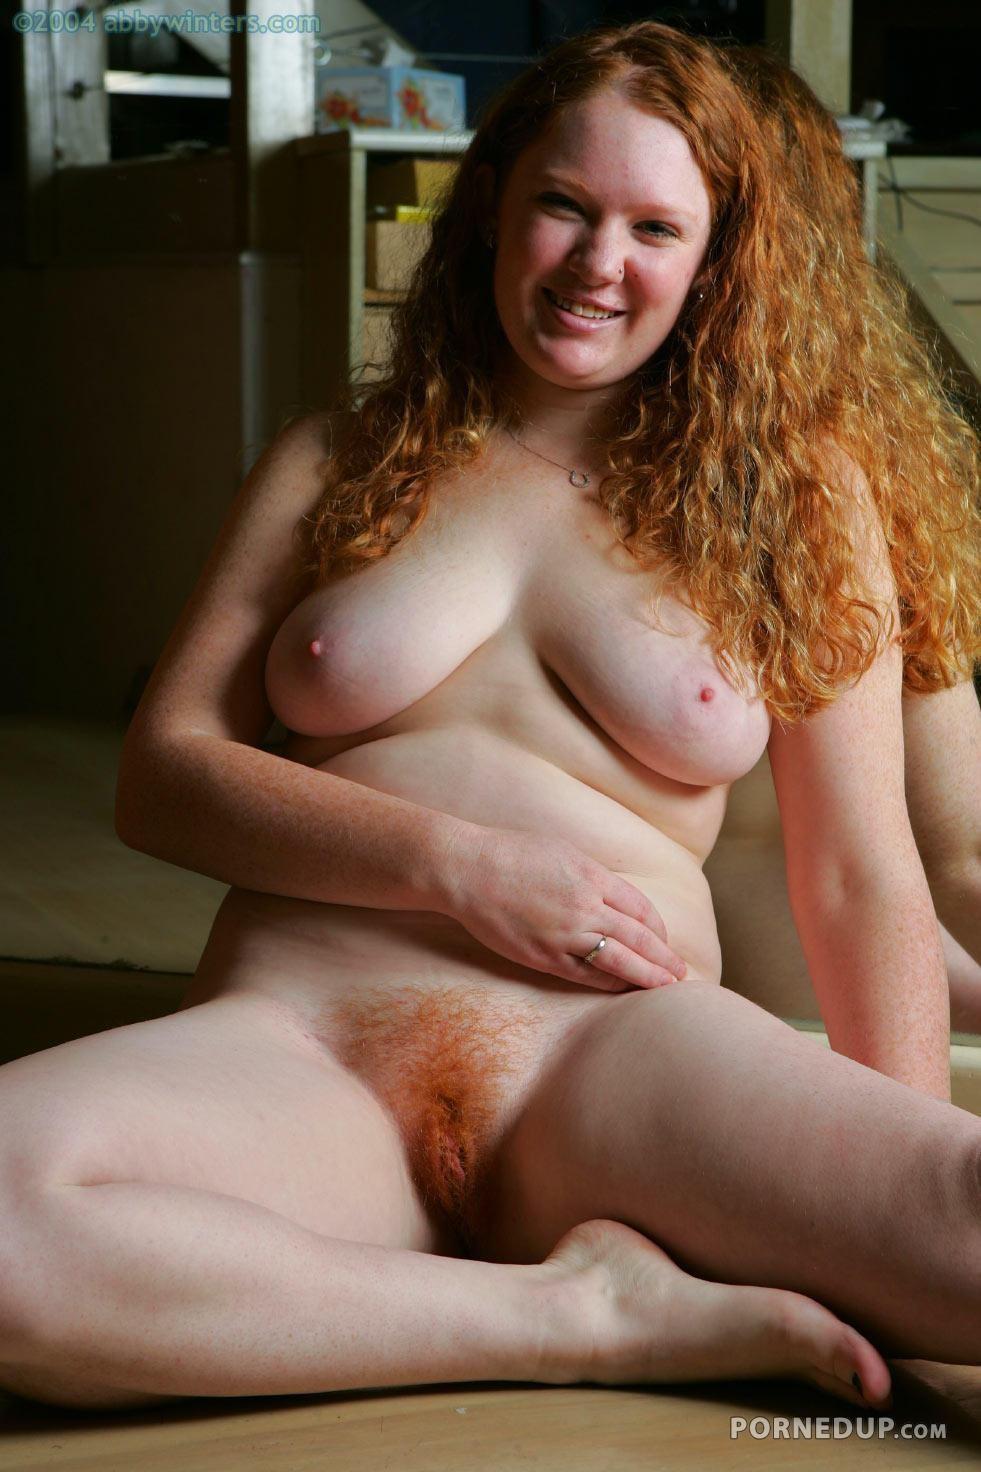 Chubby Redhead Teen Pussy